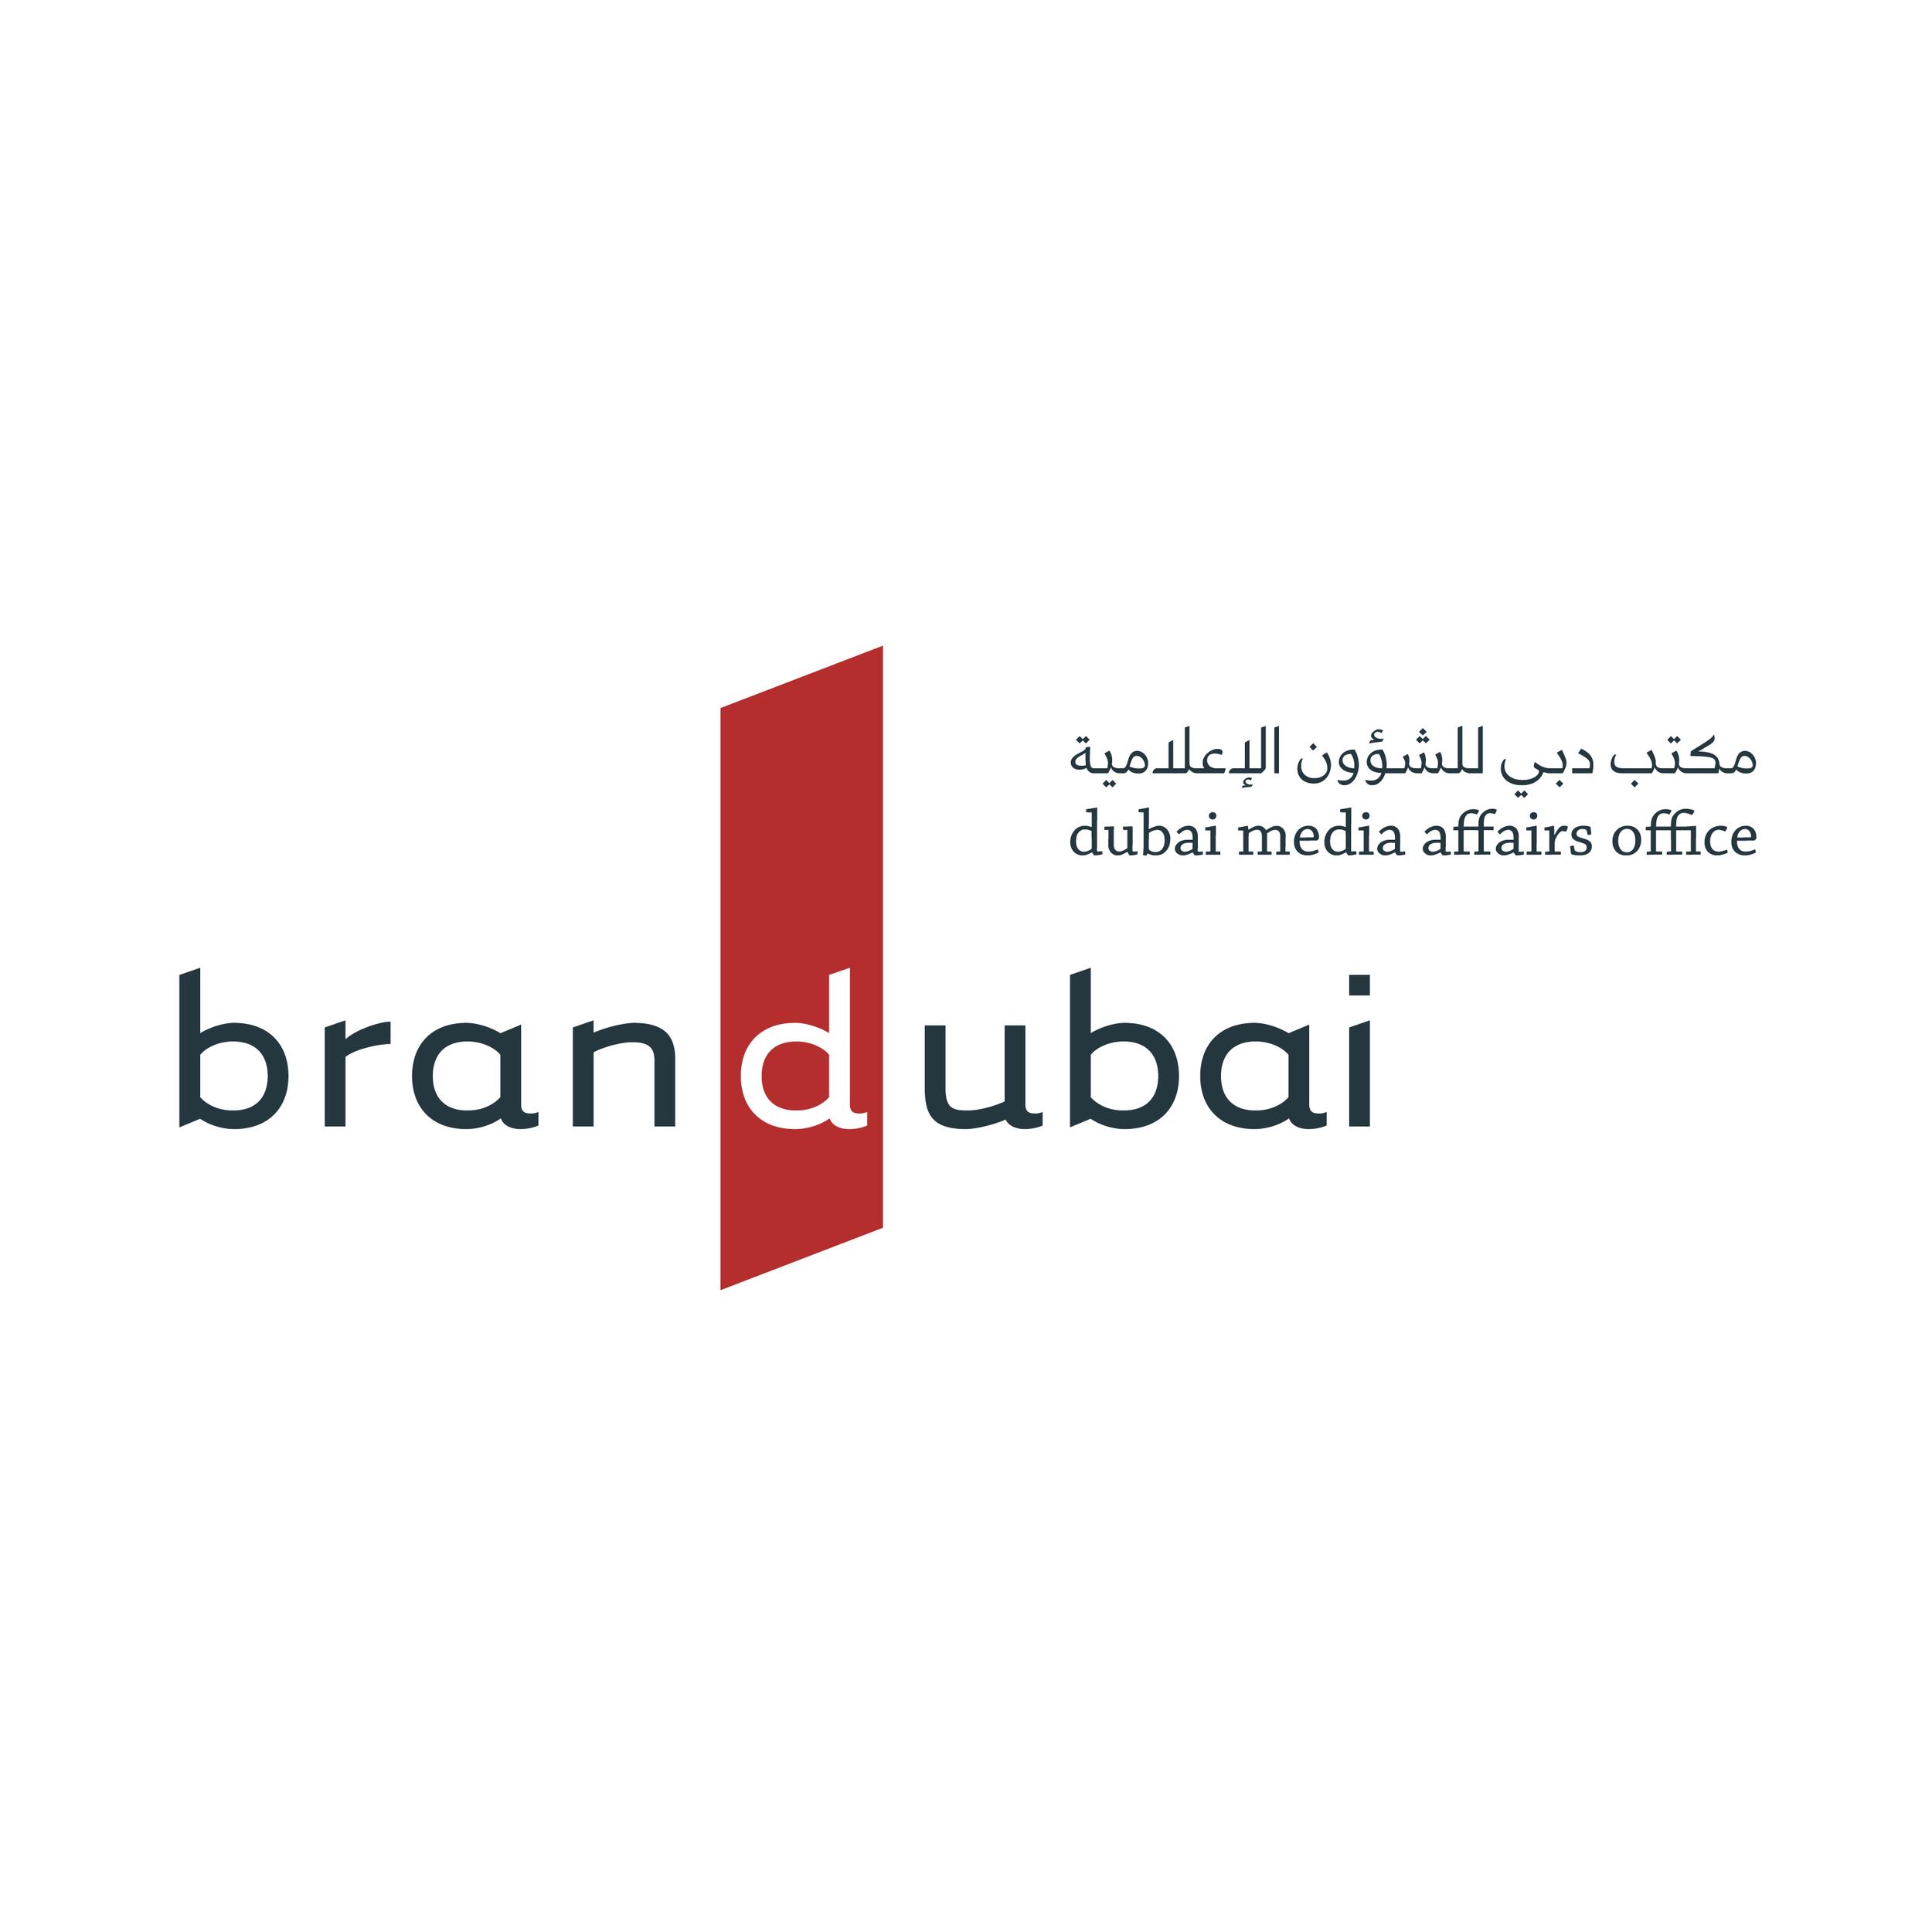 Brand Dubai - Dubai Media Affairs Office